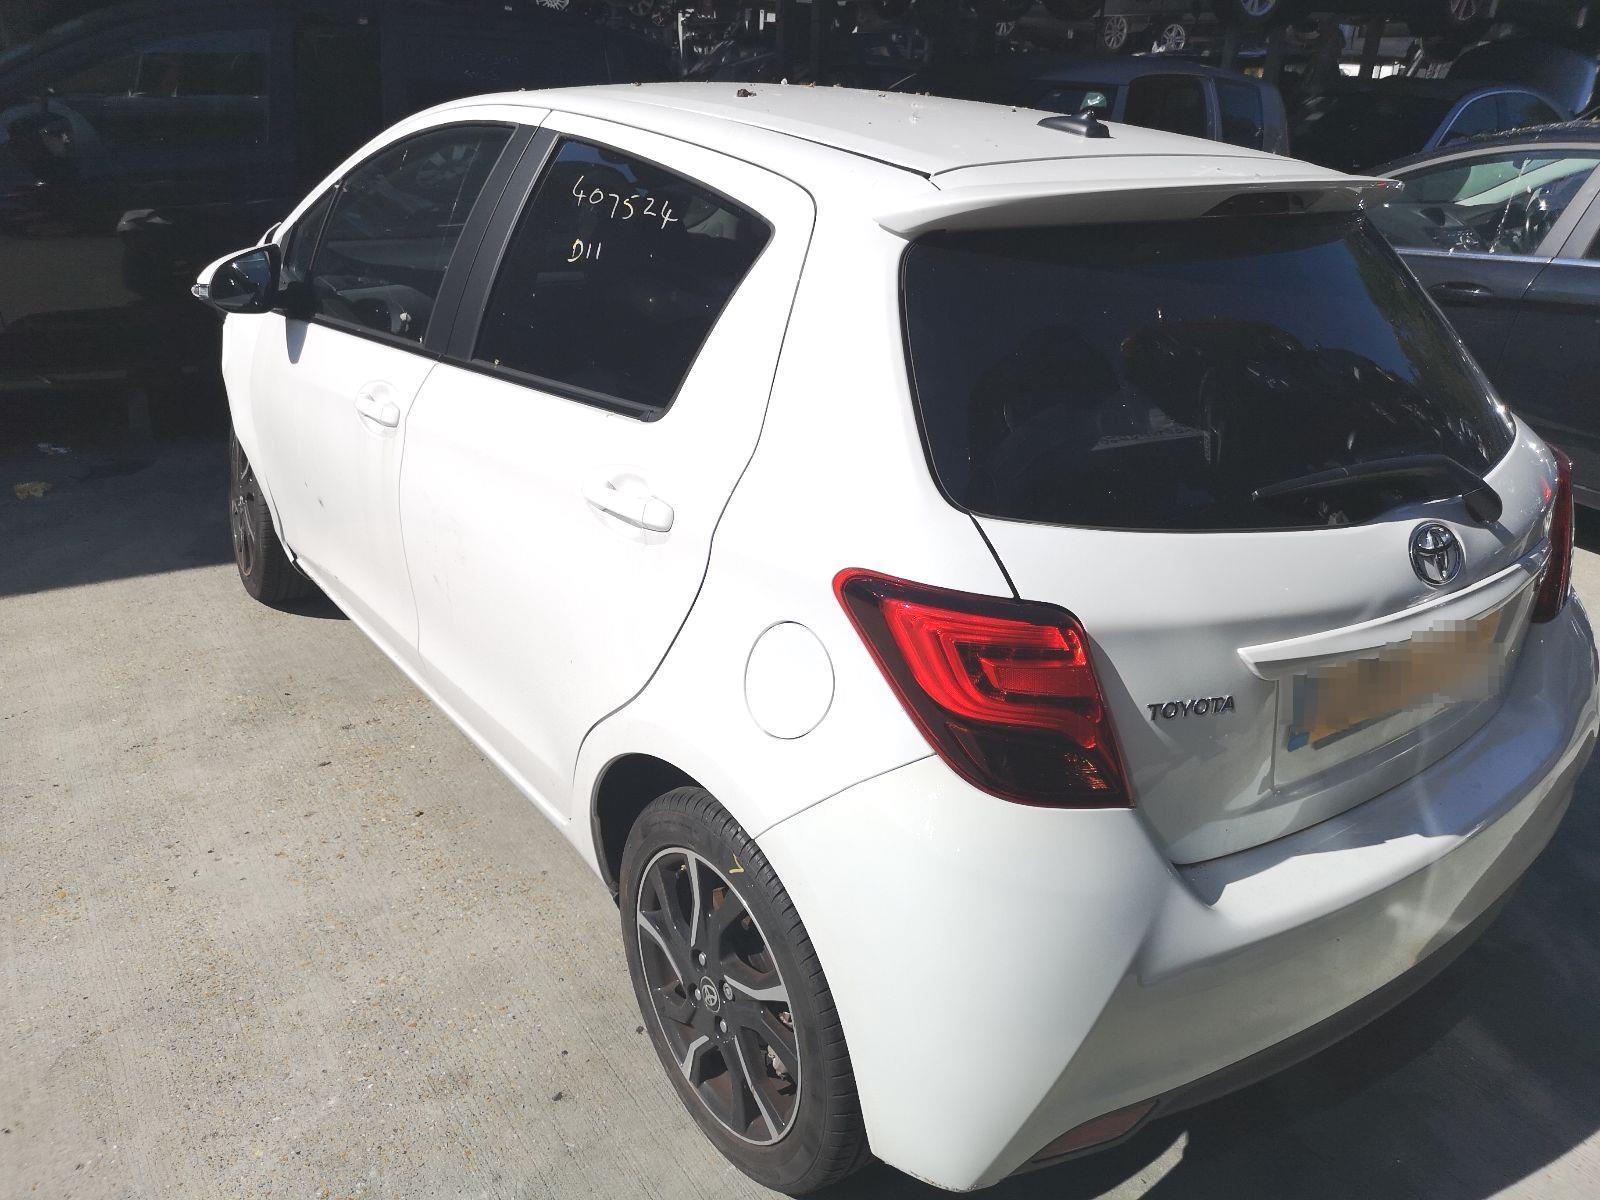 Toyota Yaris 2014 To 2017 Sport Vvt I 5 Door Hatchback Scrap Vitz Fuse Box Salvage Car For Sale Auction Silverlake Autoparts